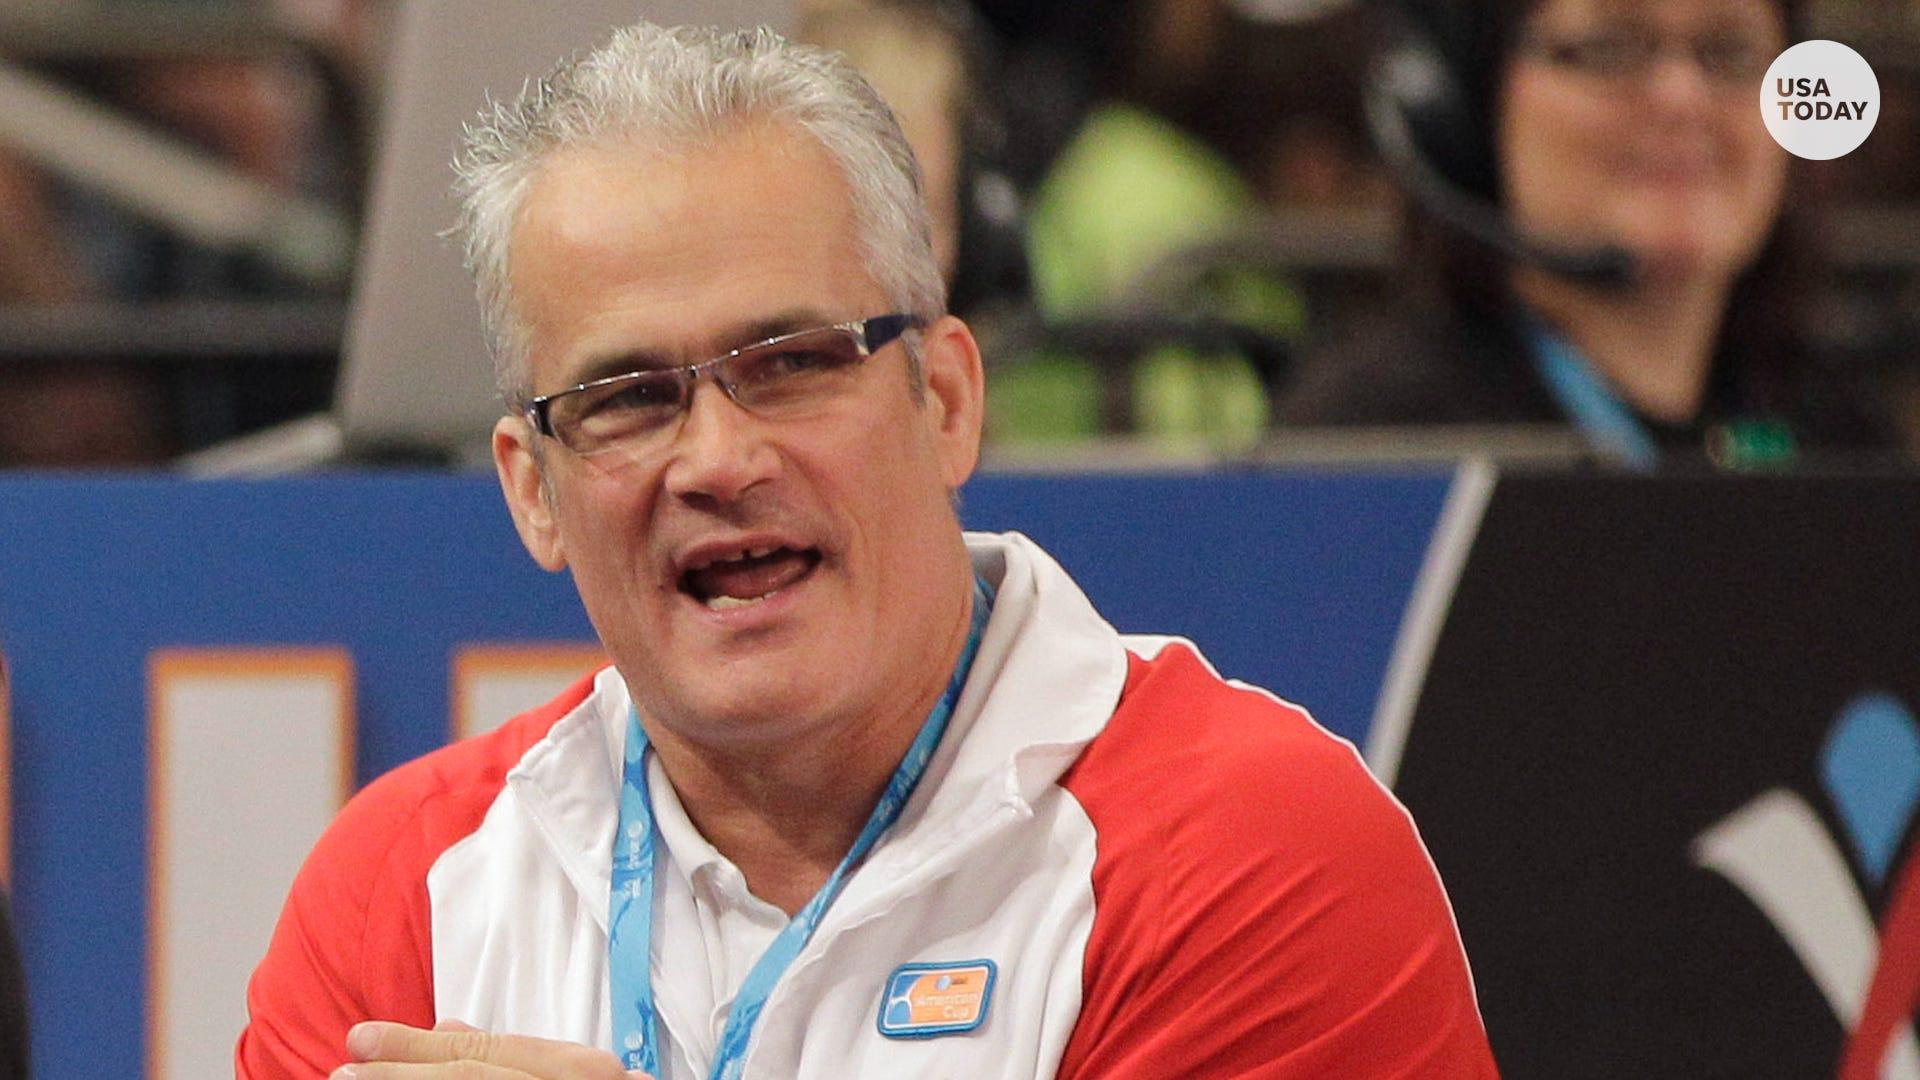 Ex-Olympic gymnastics coach John Geddert kills himself after sexual assault charges